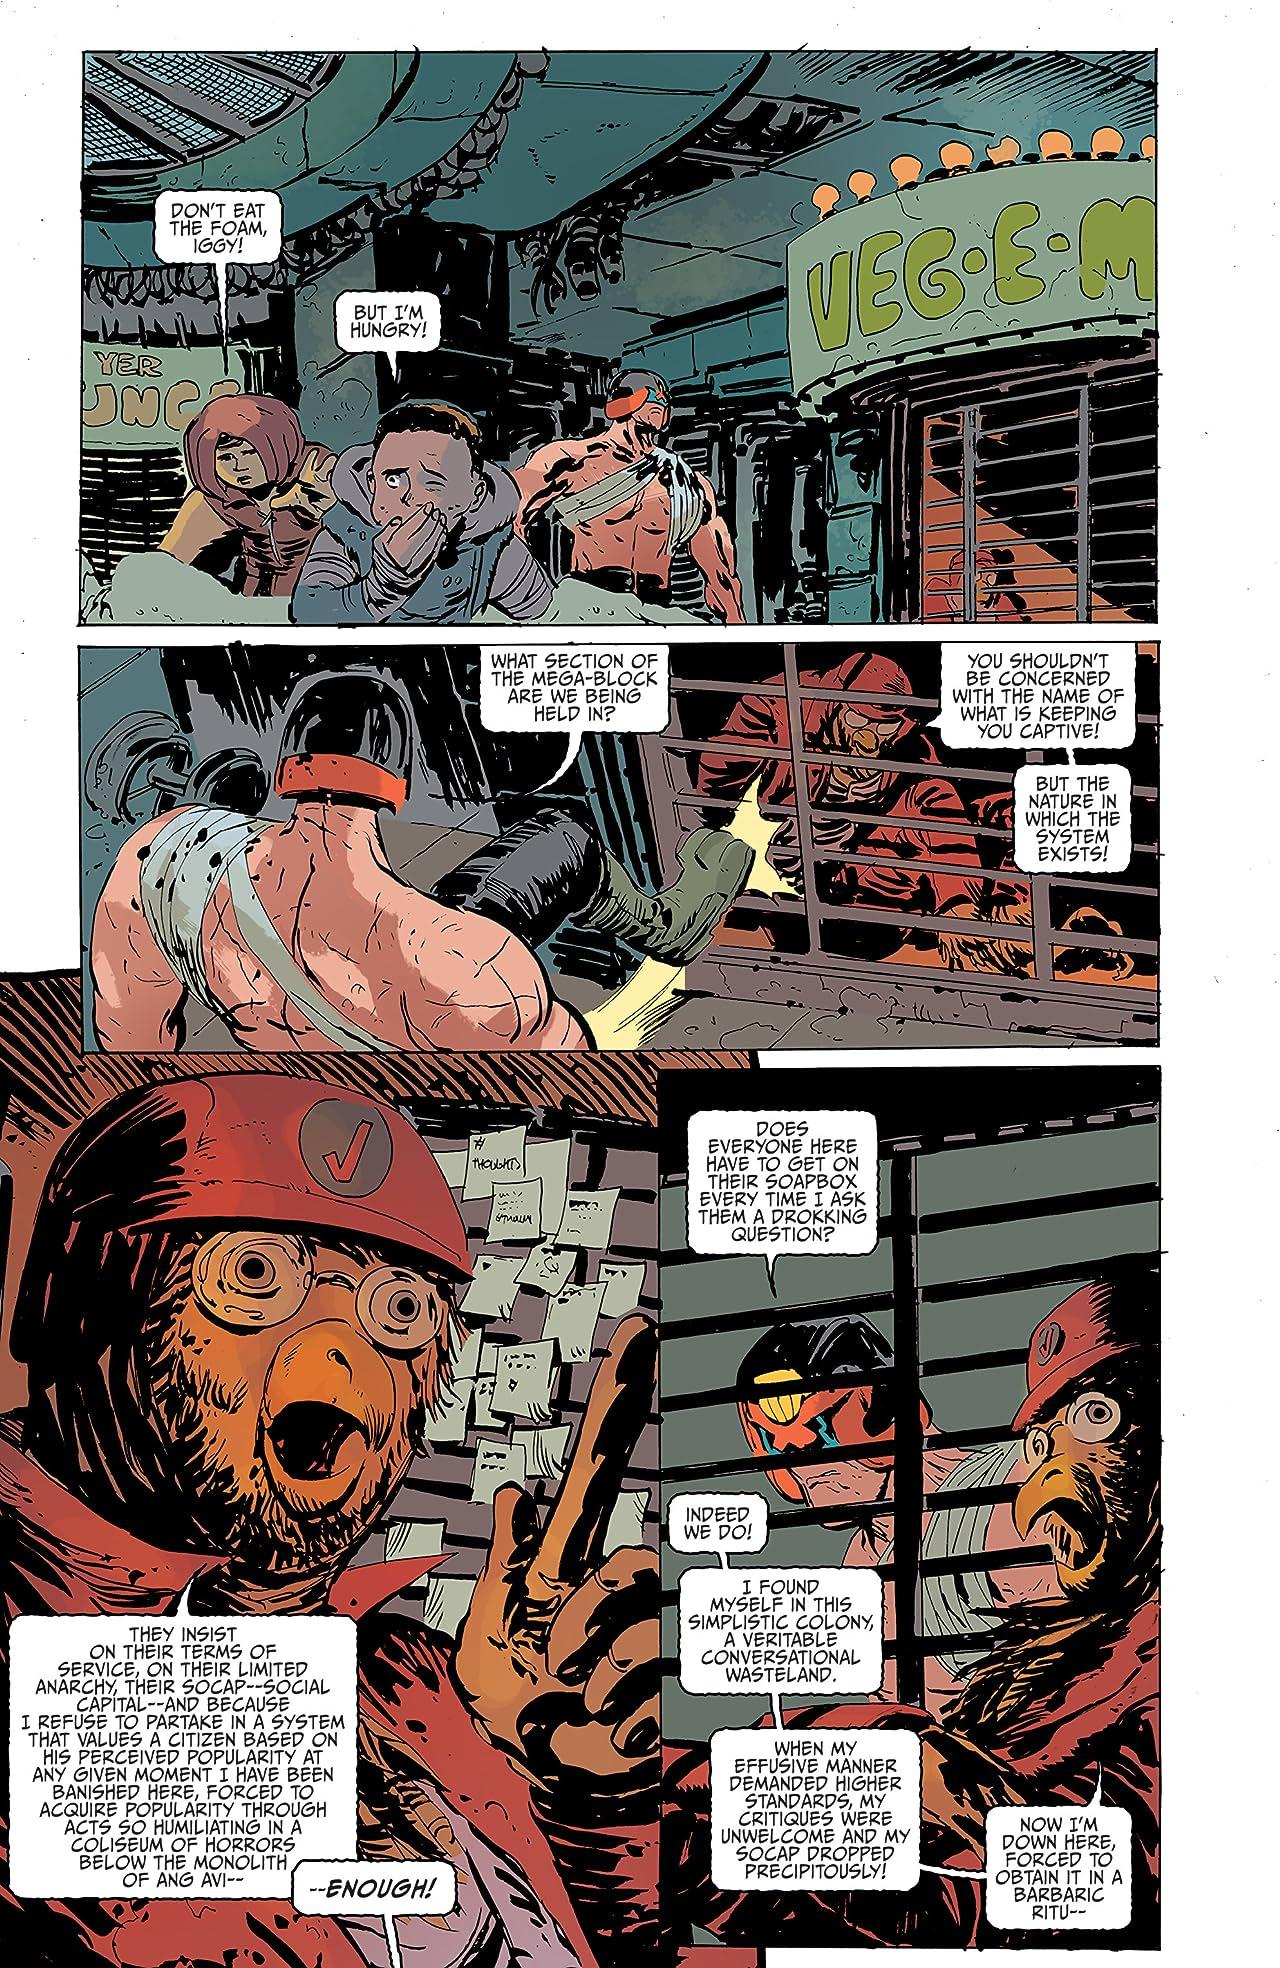 Judge Dredd (2015-2016) #3